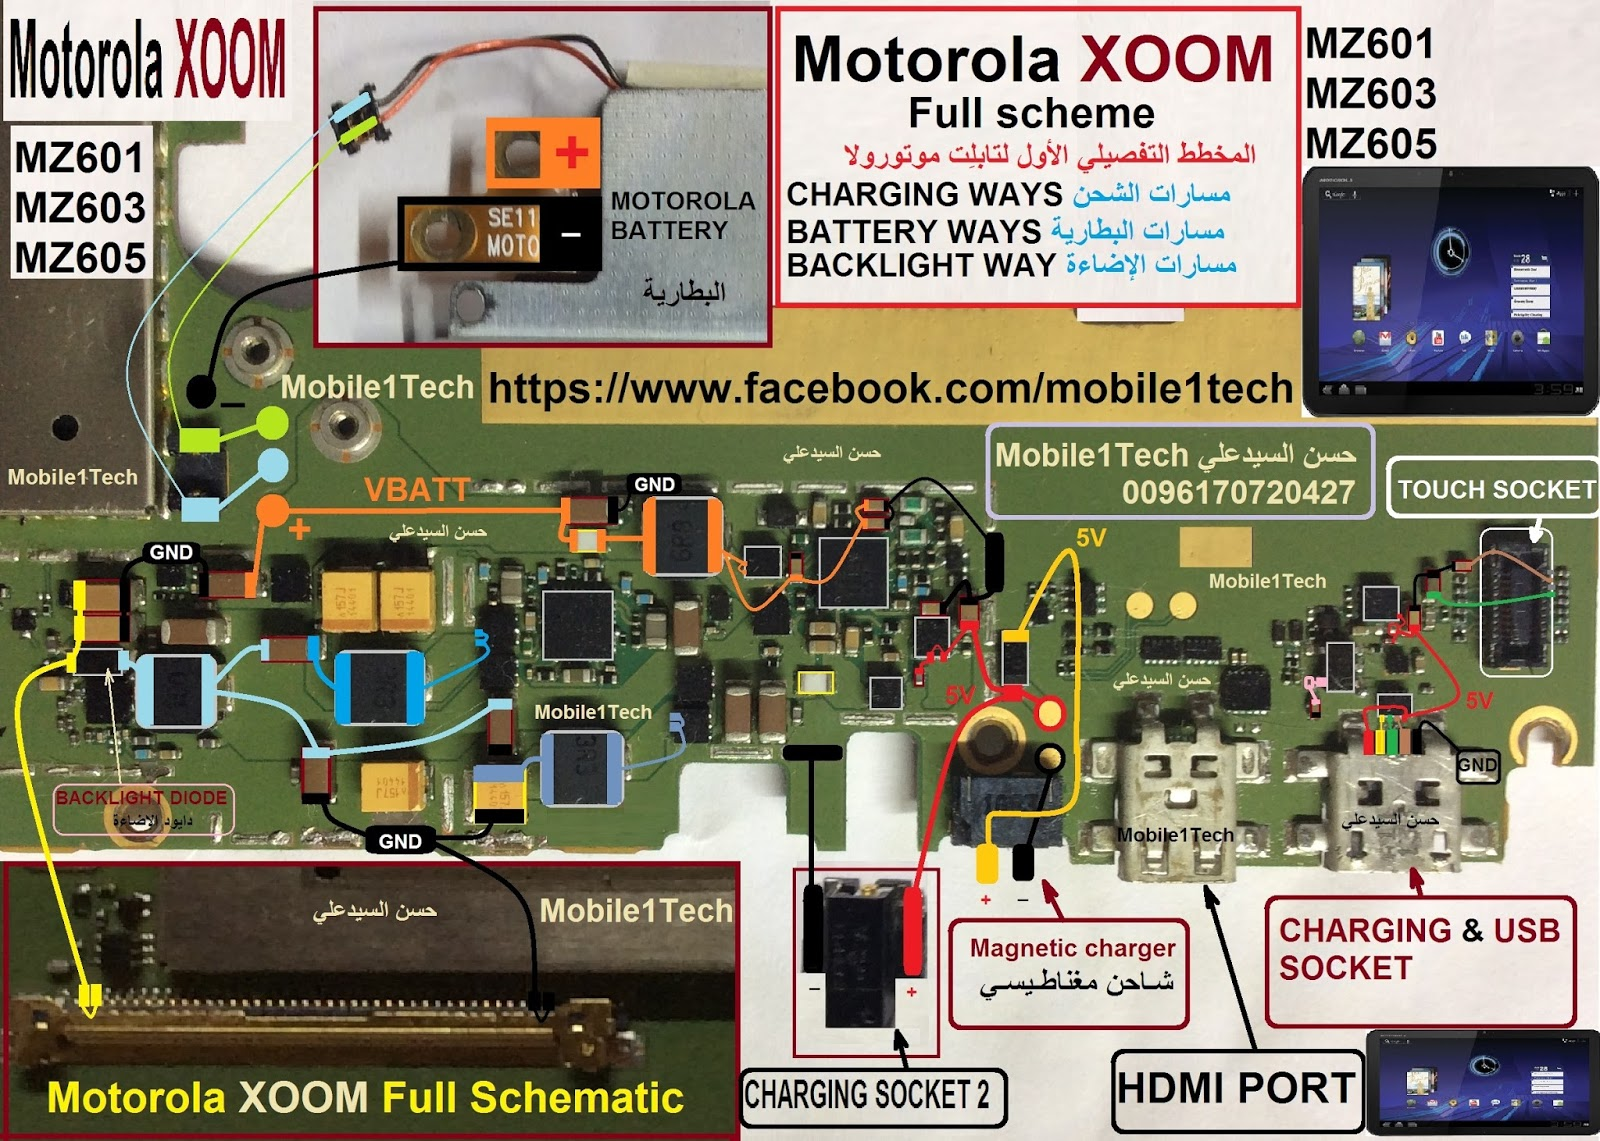 Motorola Xoom Mz601  Mz603  Mz605 Schematic